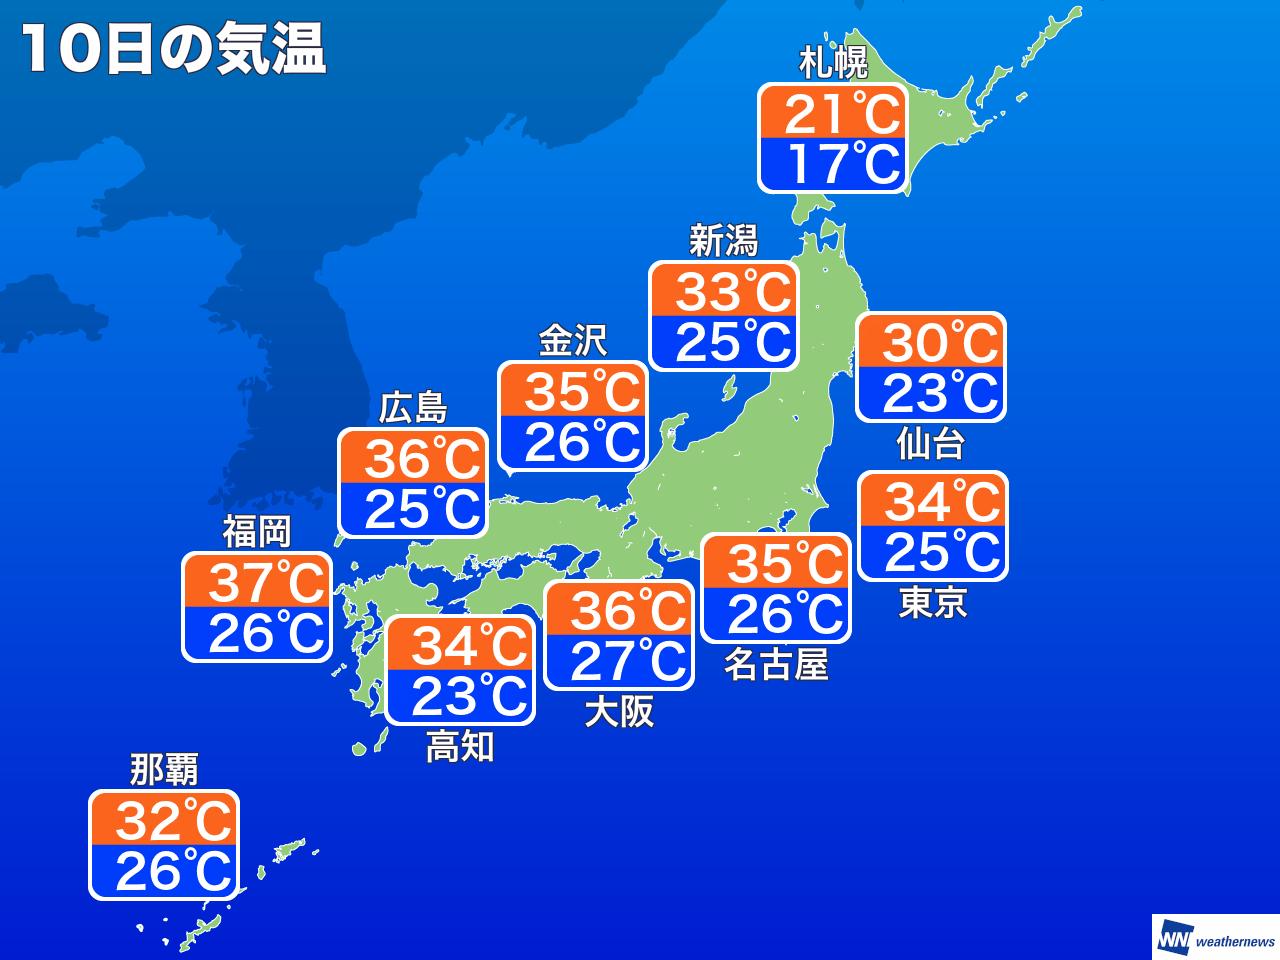 仙台 の 天気 10 日間